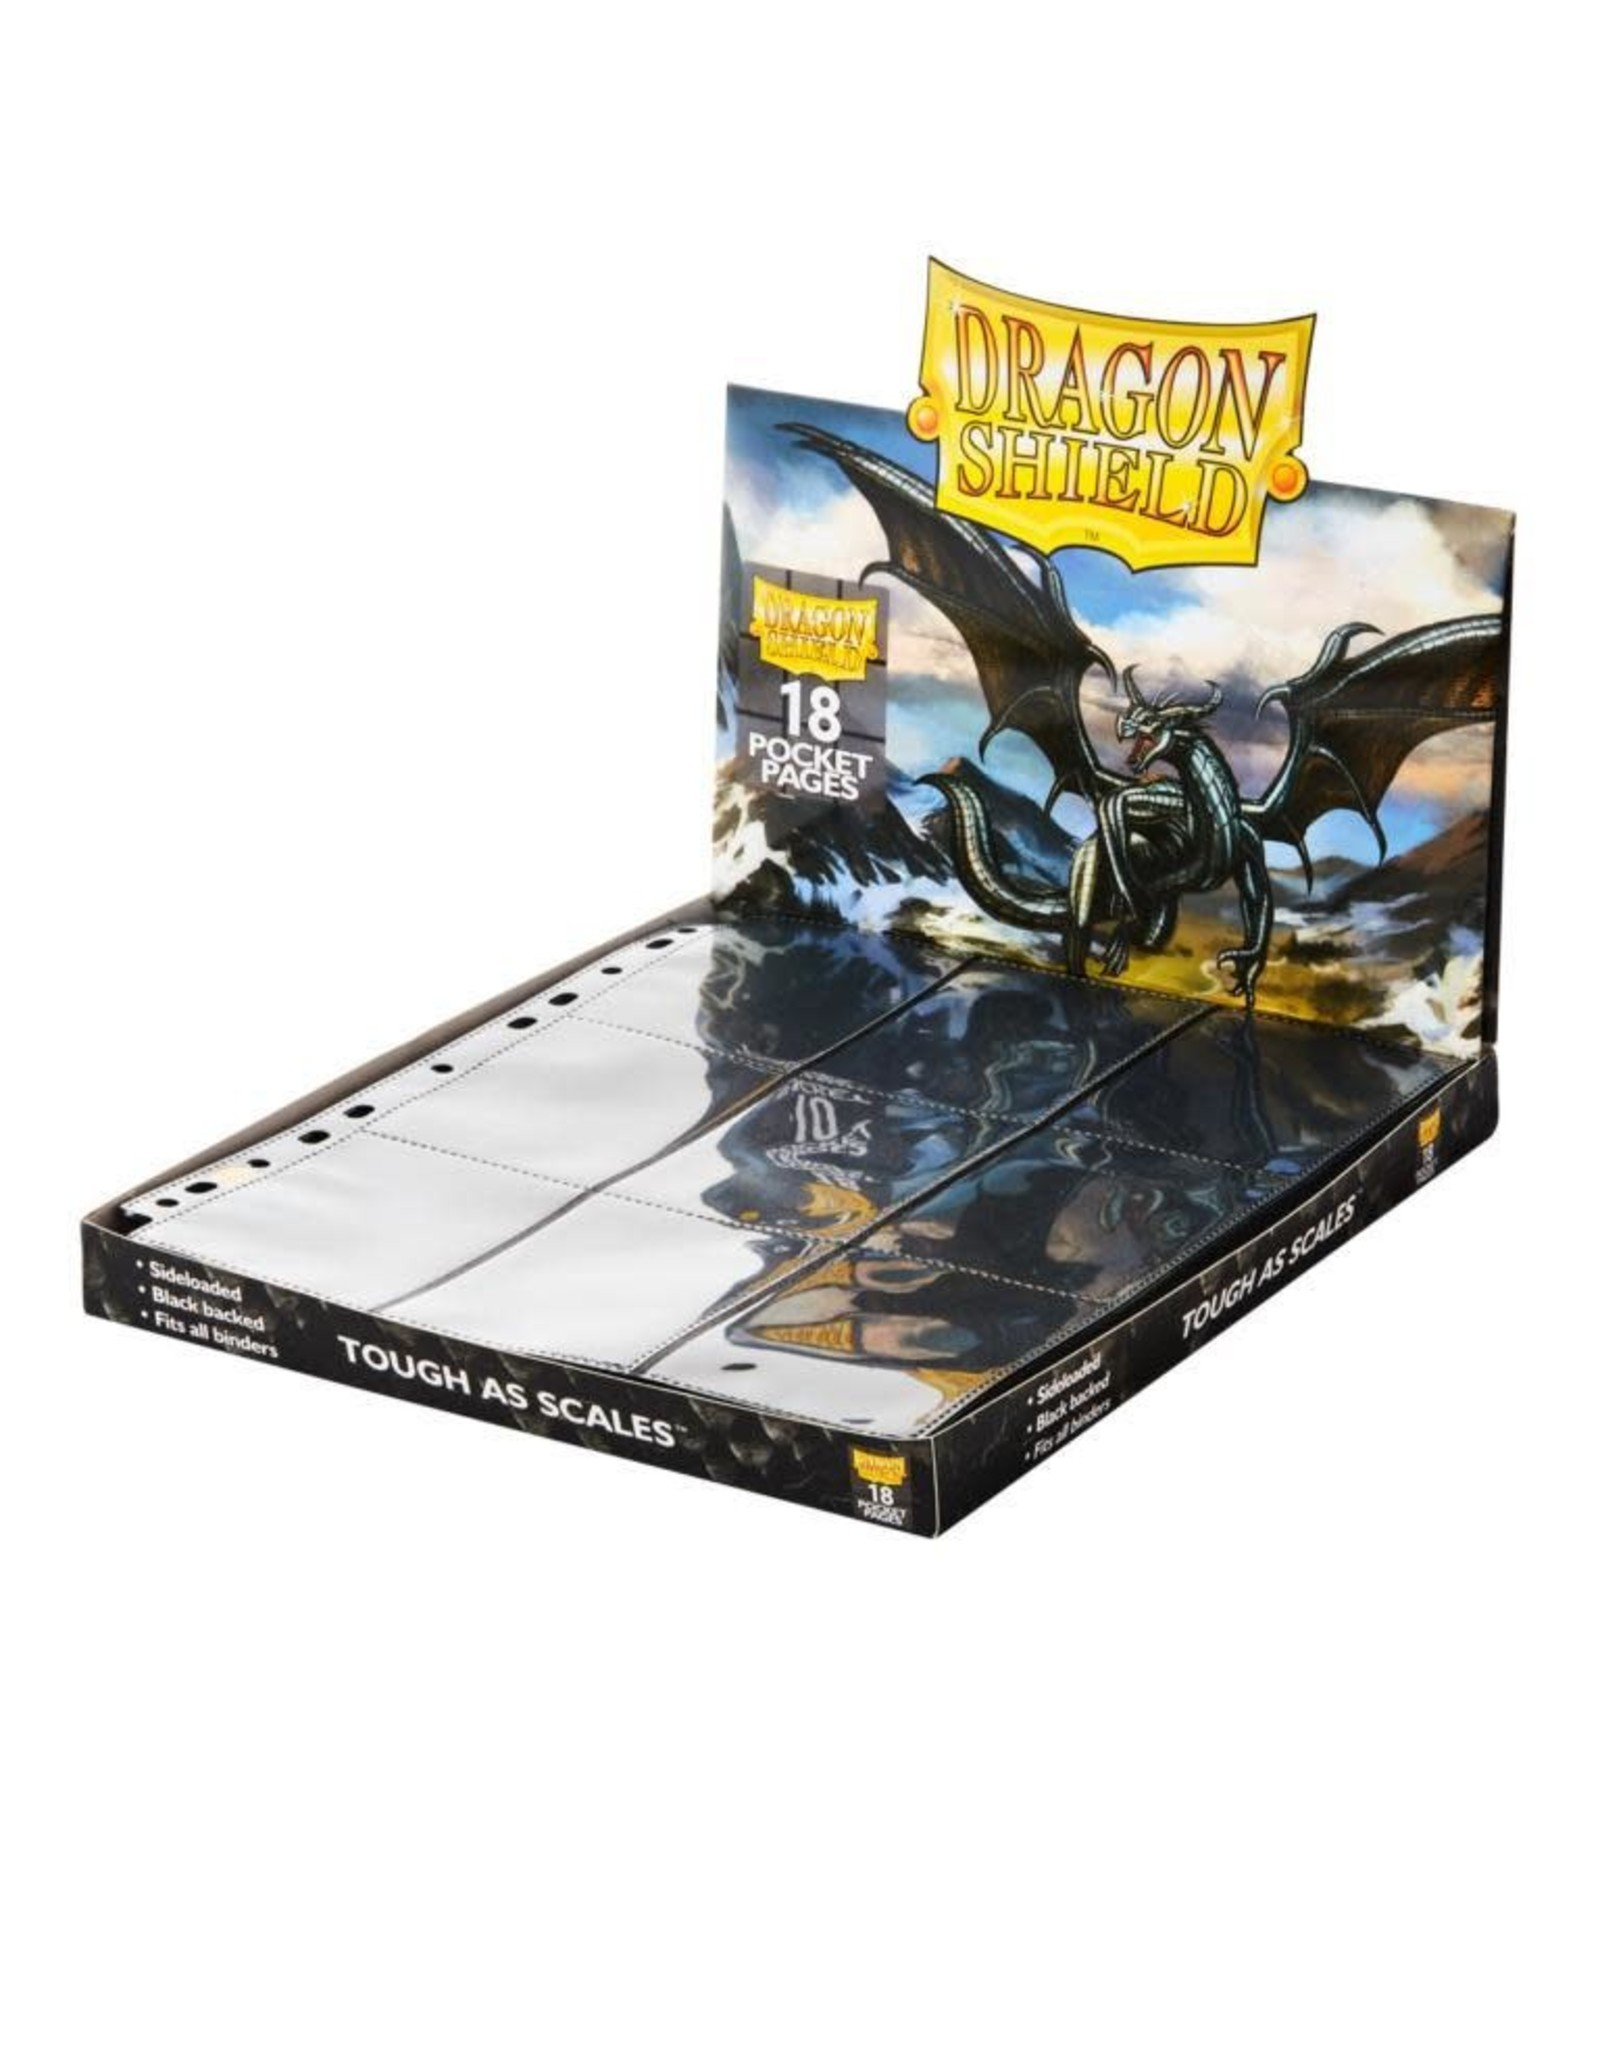 Dragon Shield 18-pocket Pages black single